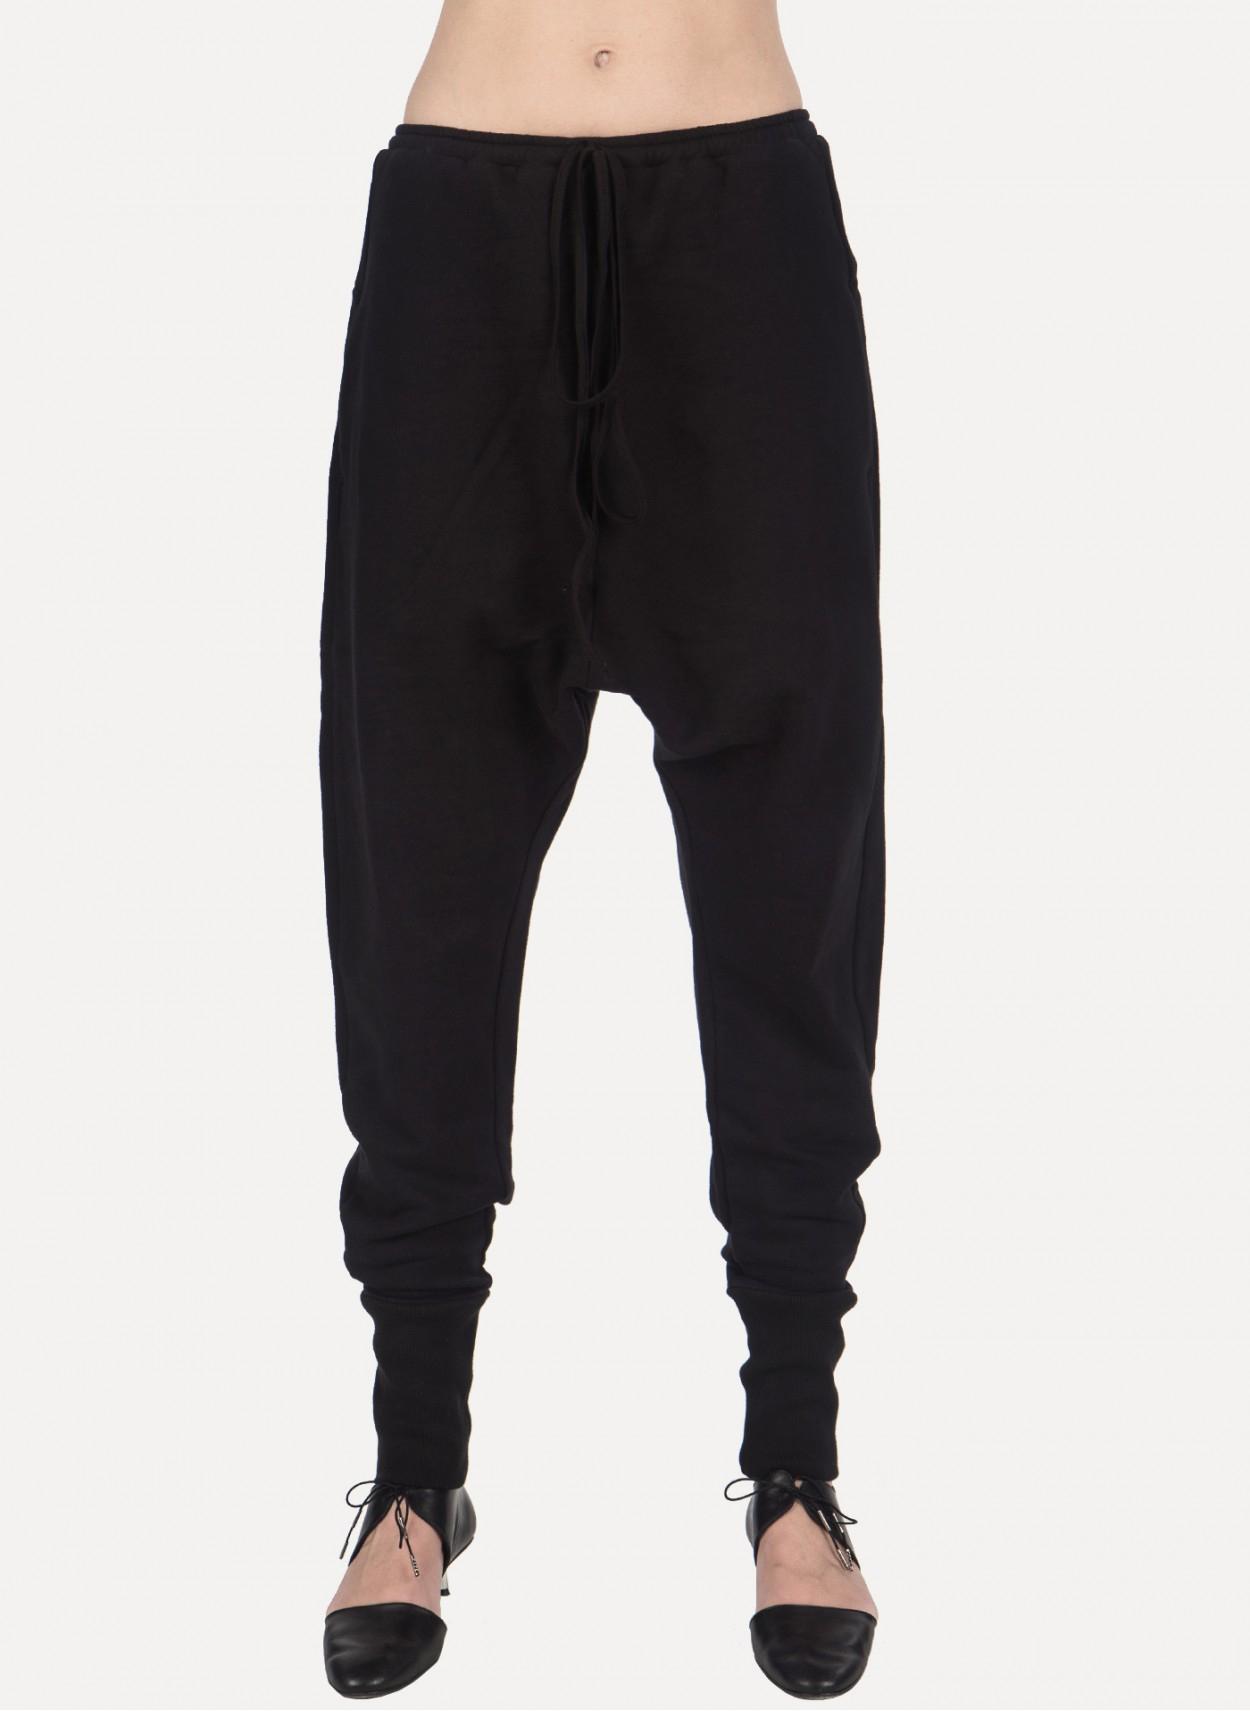 Luxury Black Women Pants DropCrotch Women Pants Yoga Pants Loose Pants